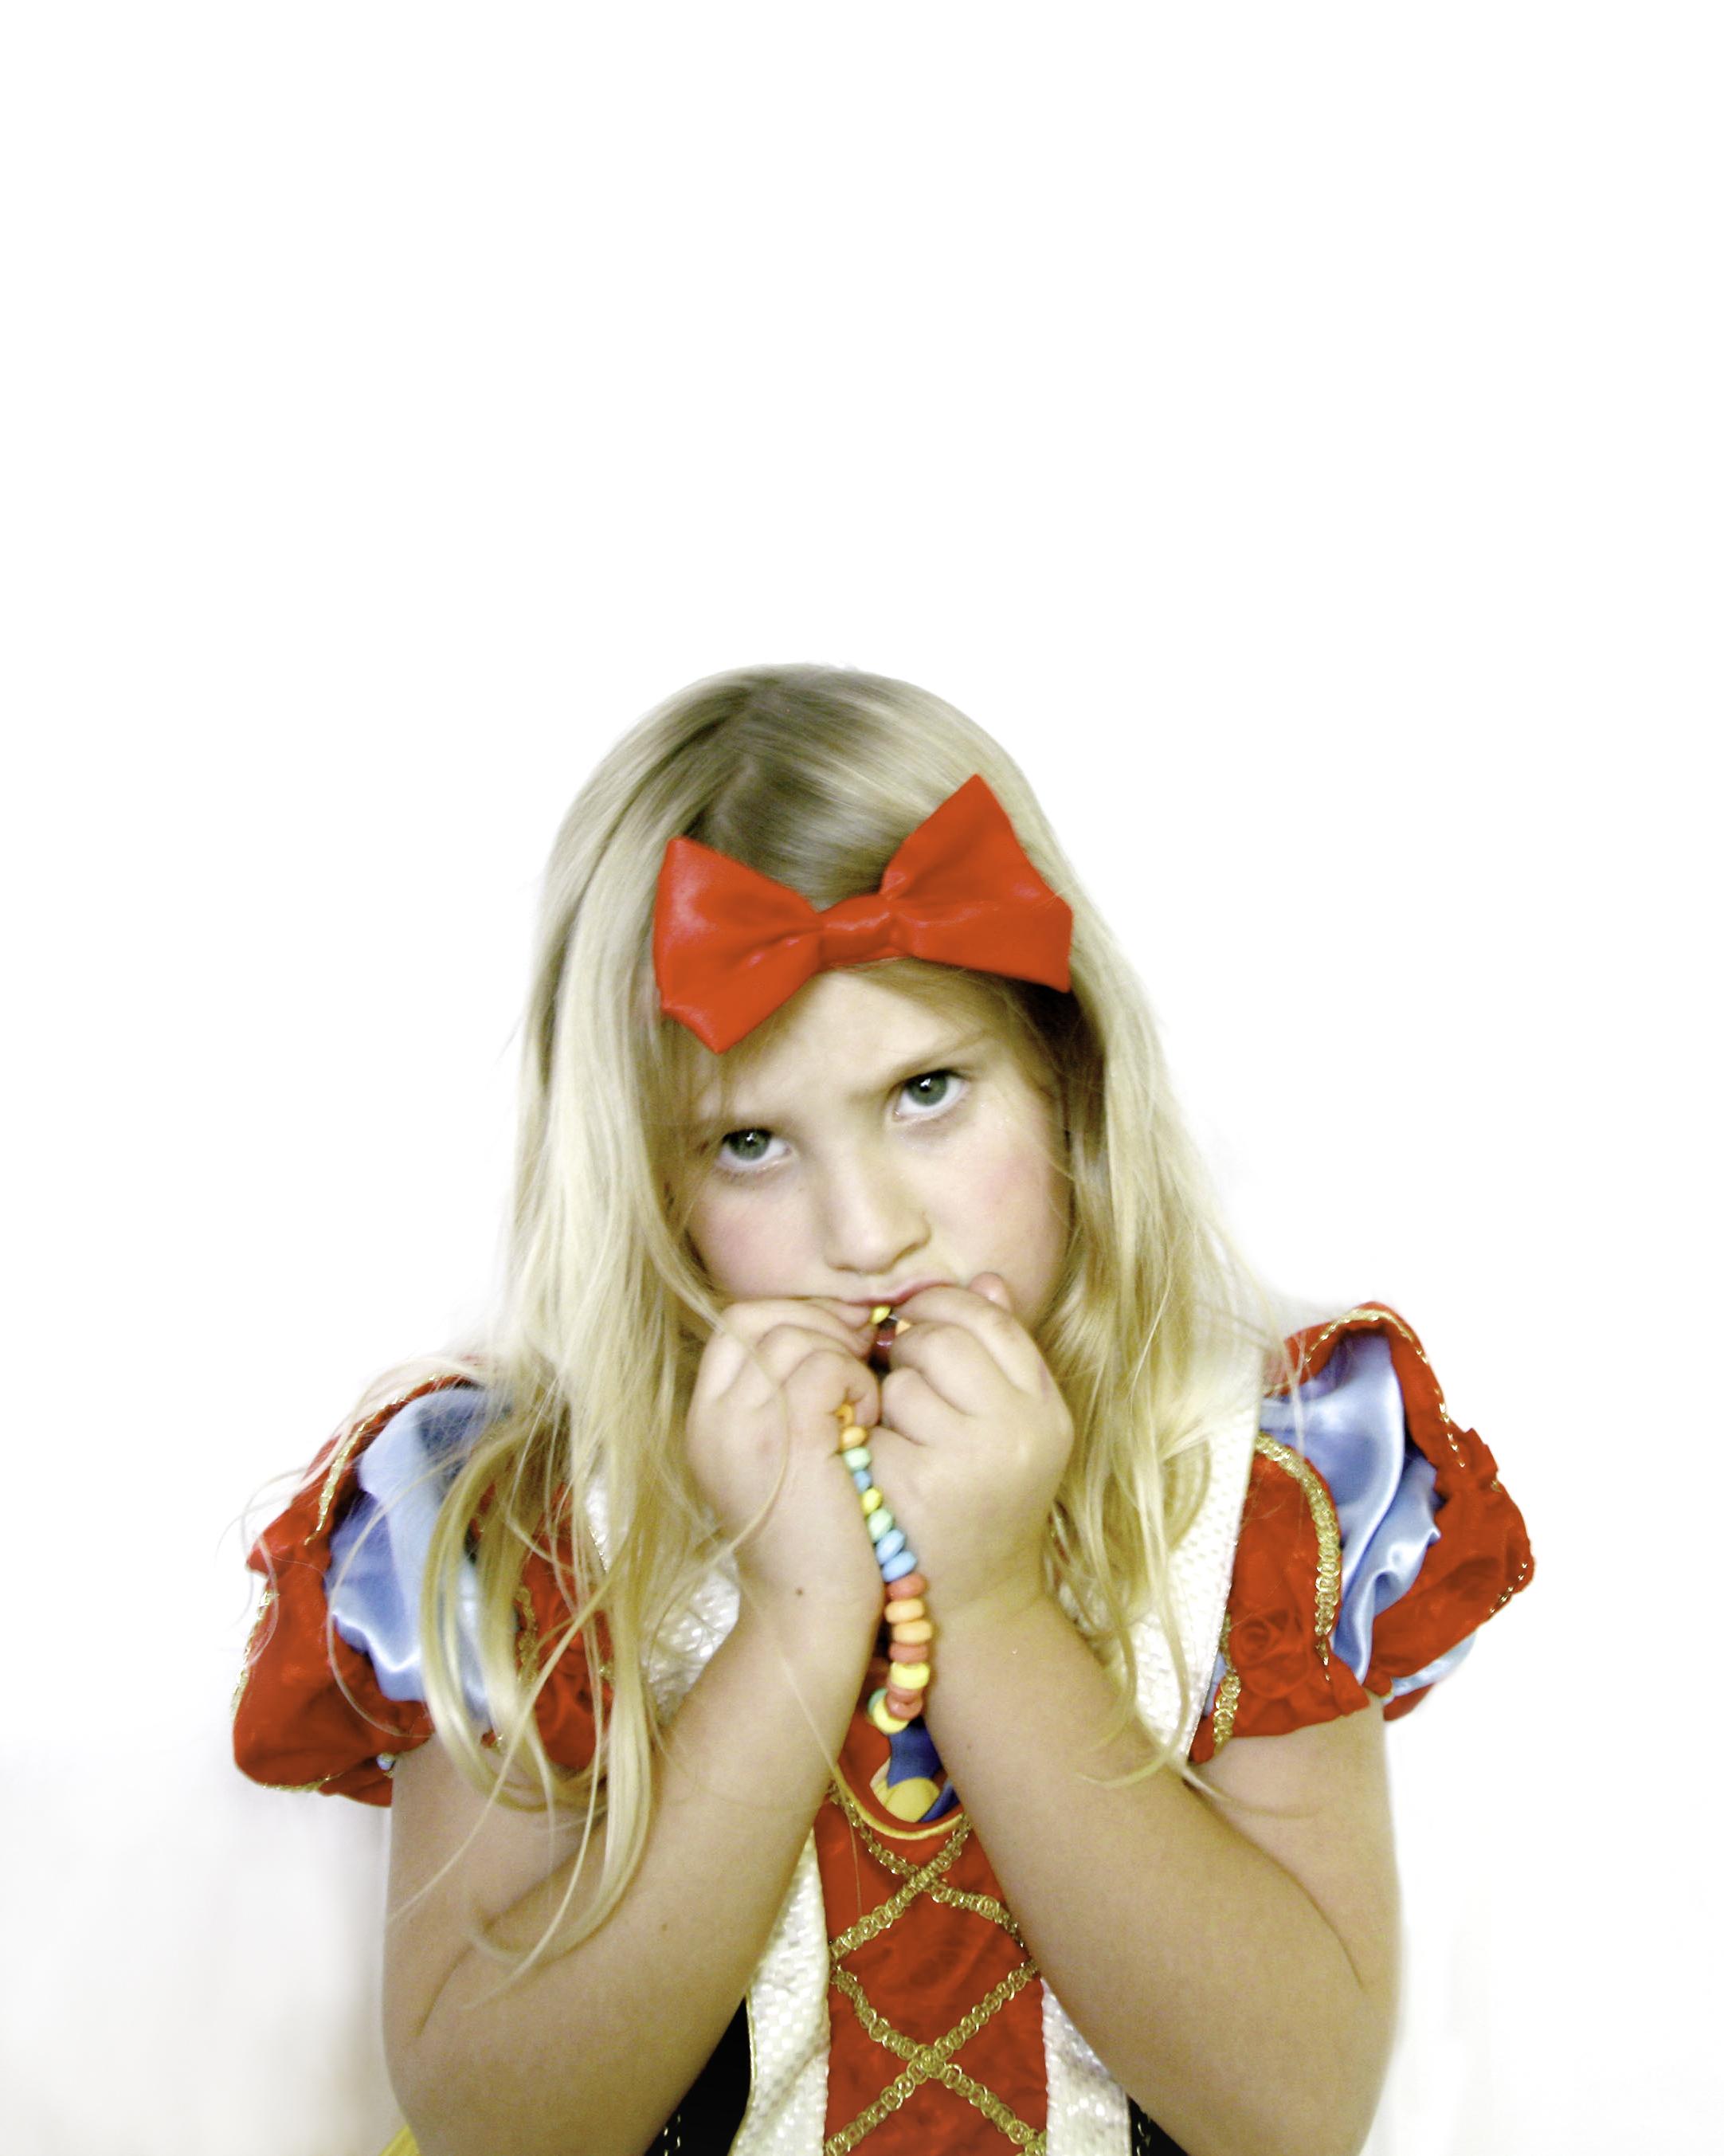 IMG_6952_maddie_princess_ritathompson.jpg